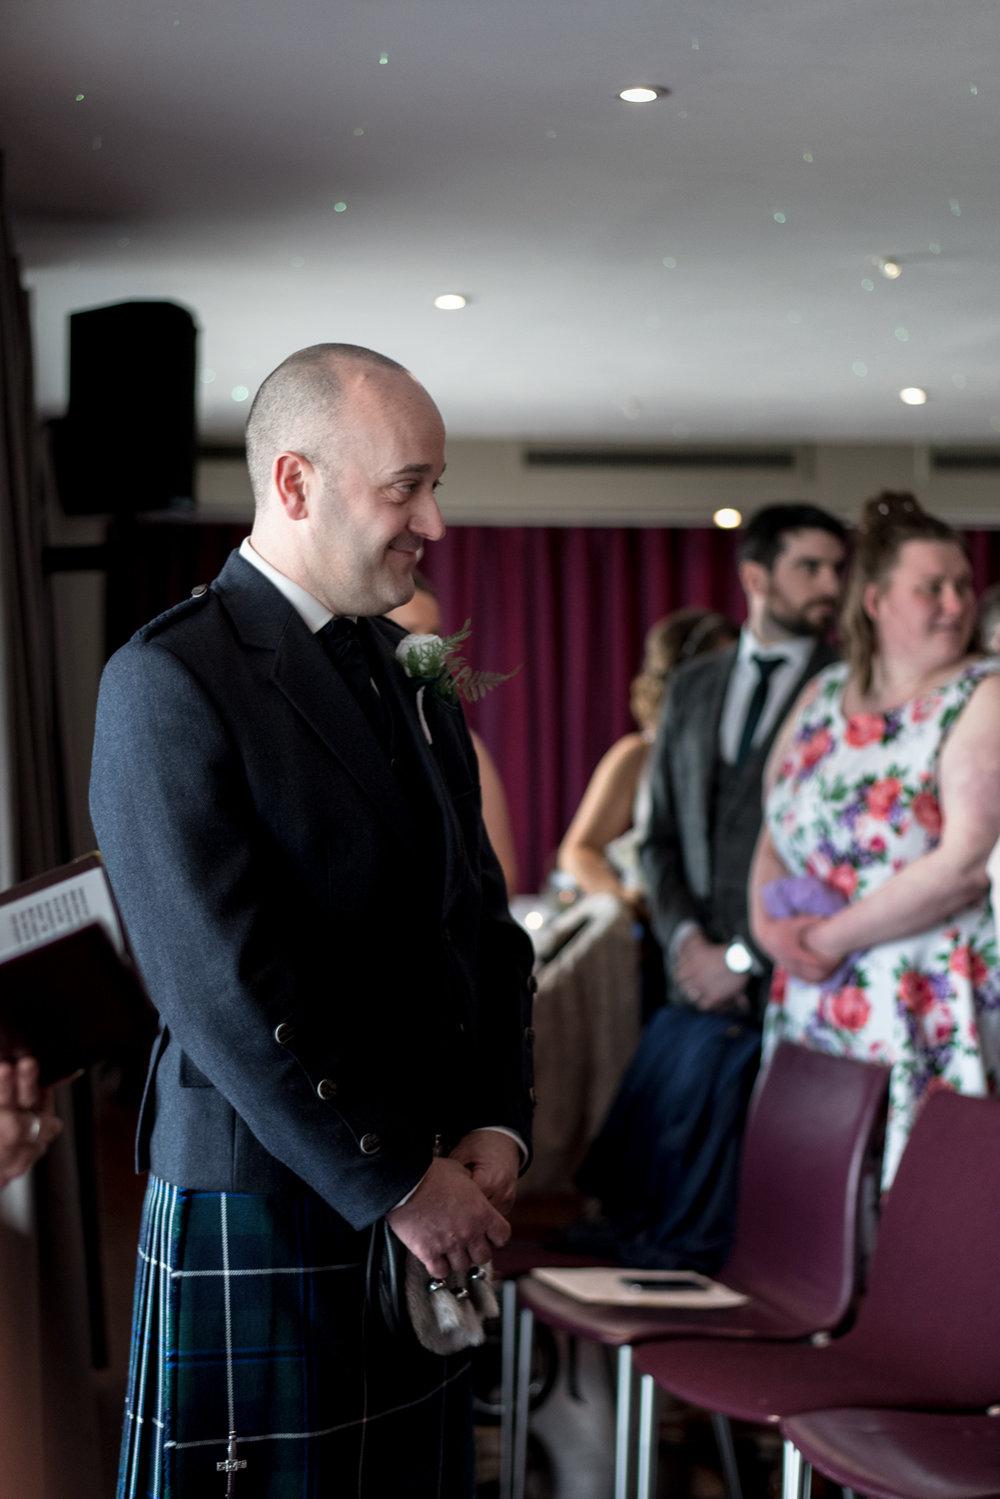 South Queensferry Orocco Pier Wedding - groom